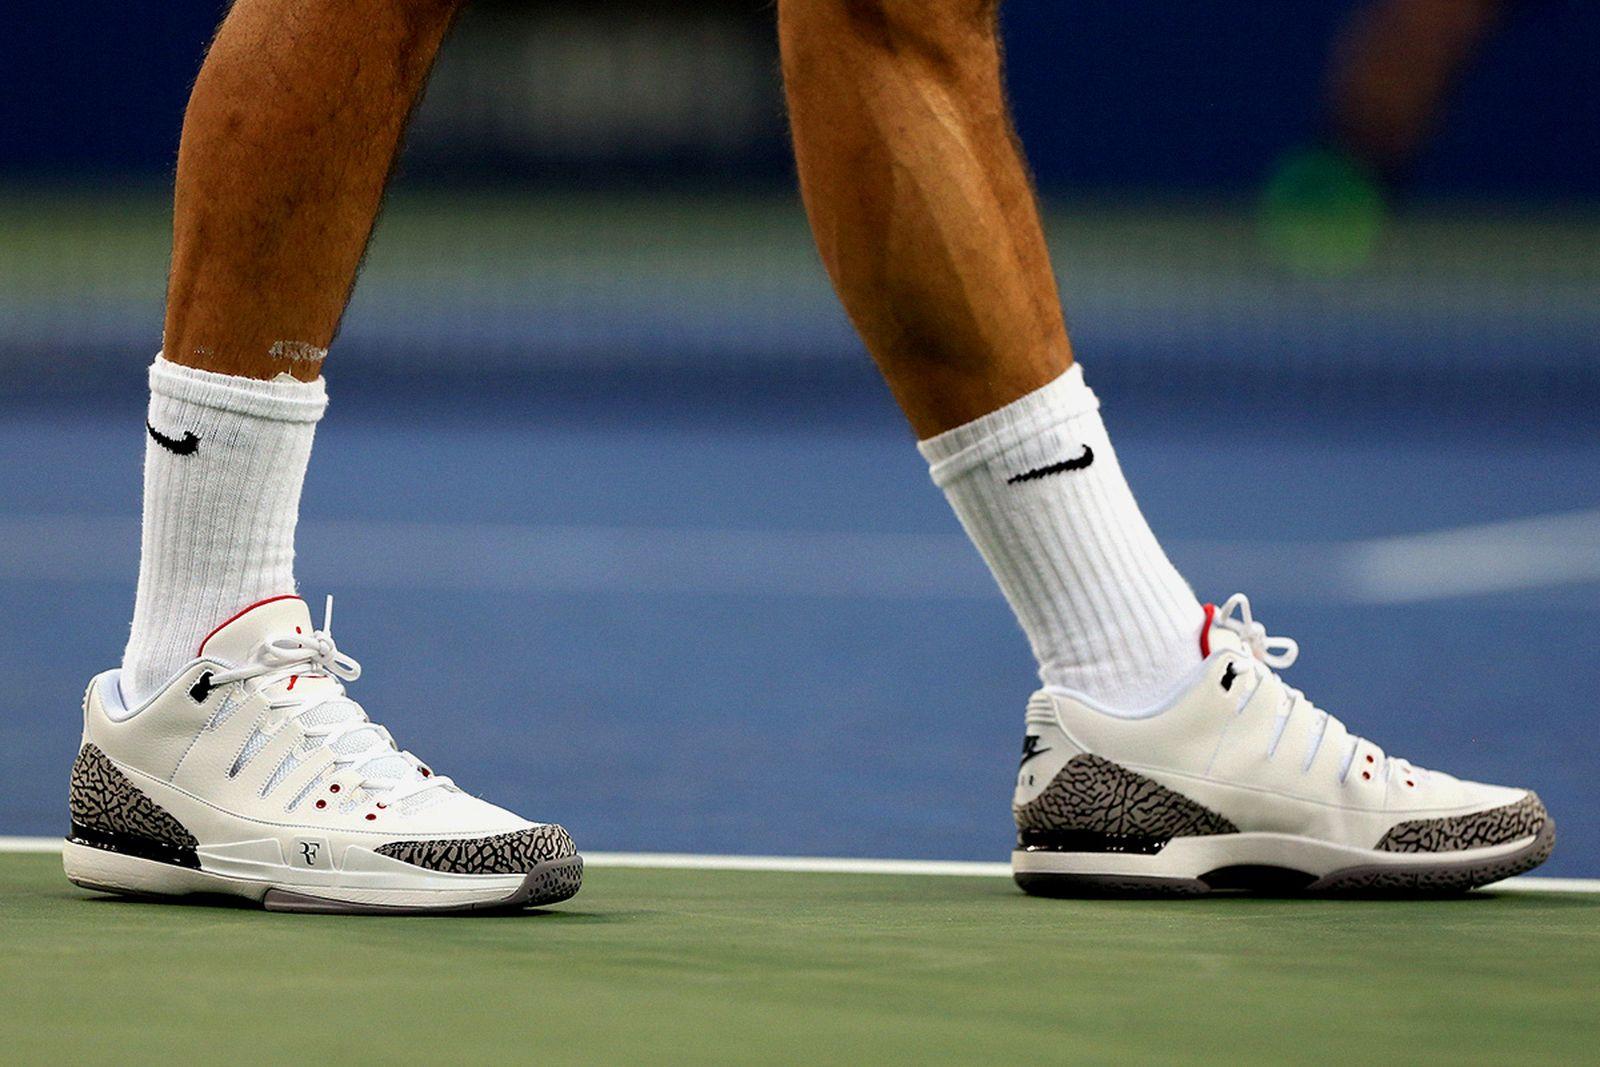 best-signature-tennis-shoes-main